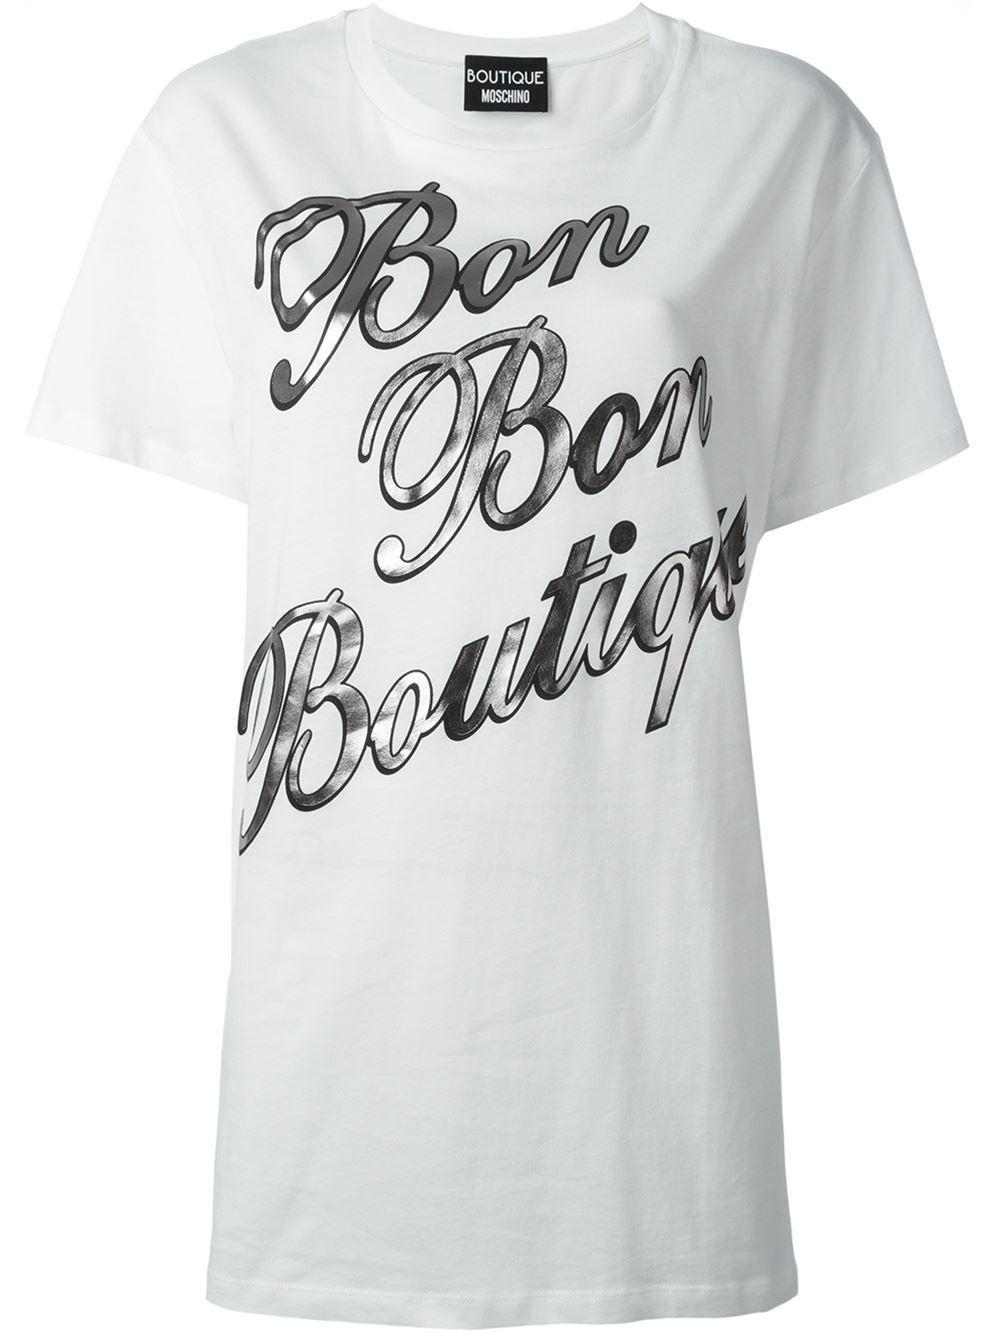 Boutique Moschino Bon Bon Boutique print T-shirt